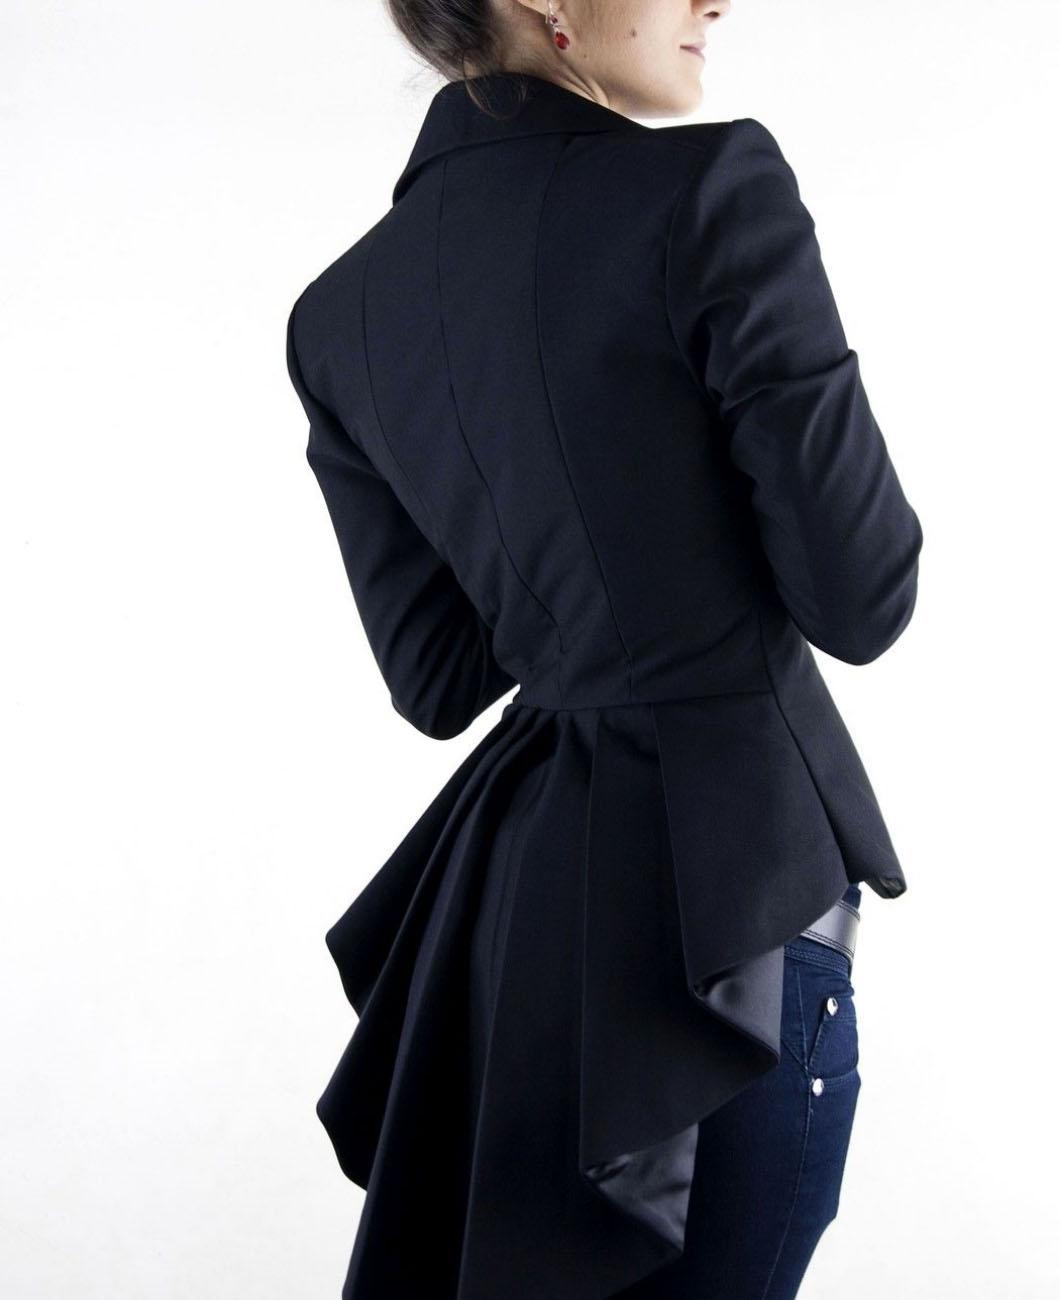 peplum-latest-trend-one-piece-la-polo-lapolo-fashion